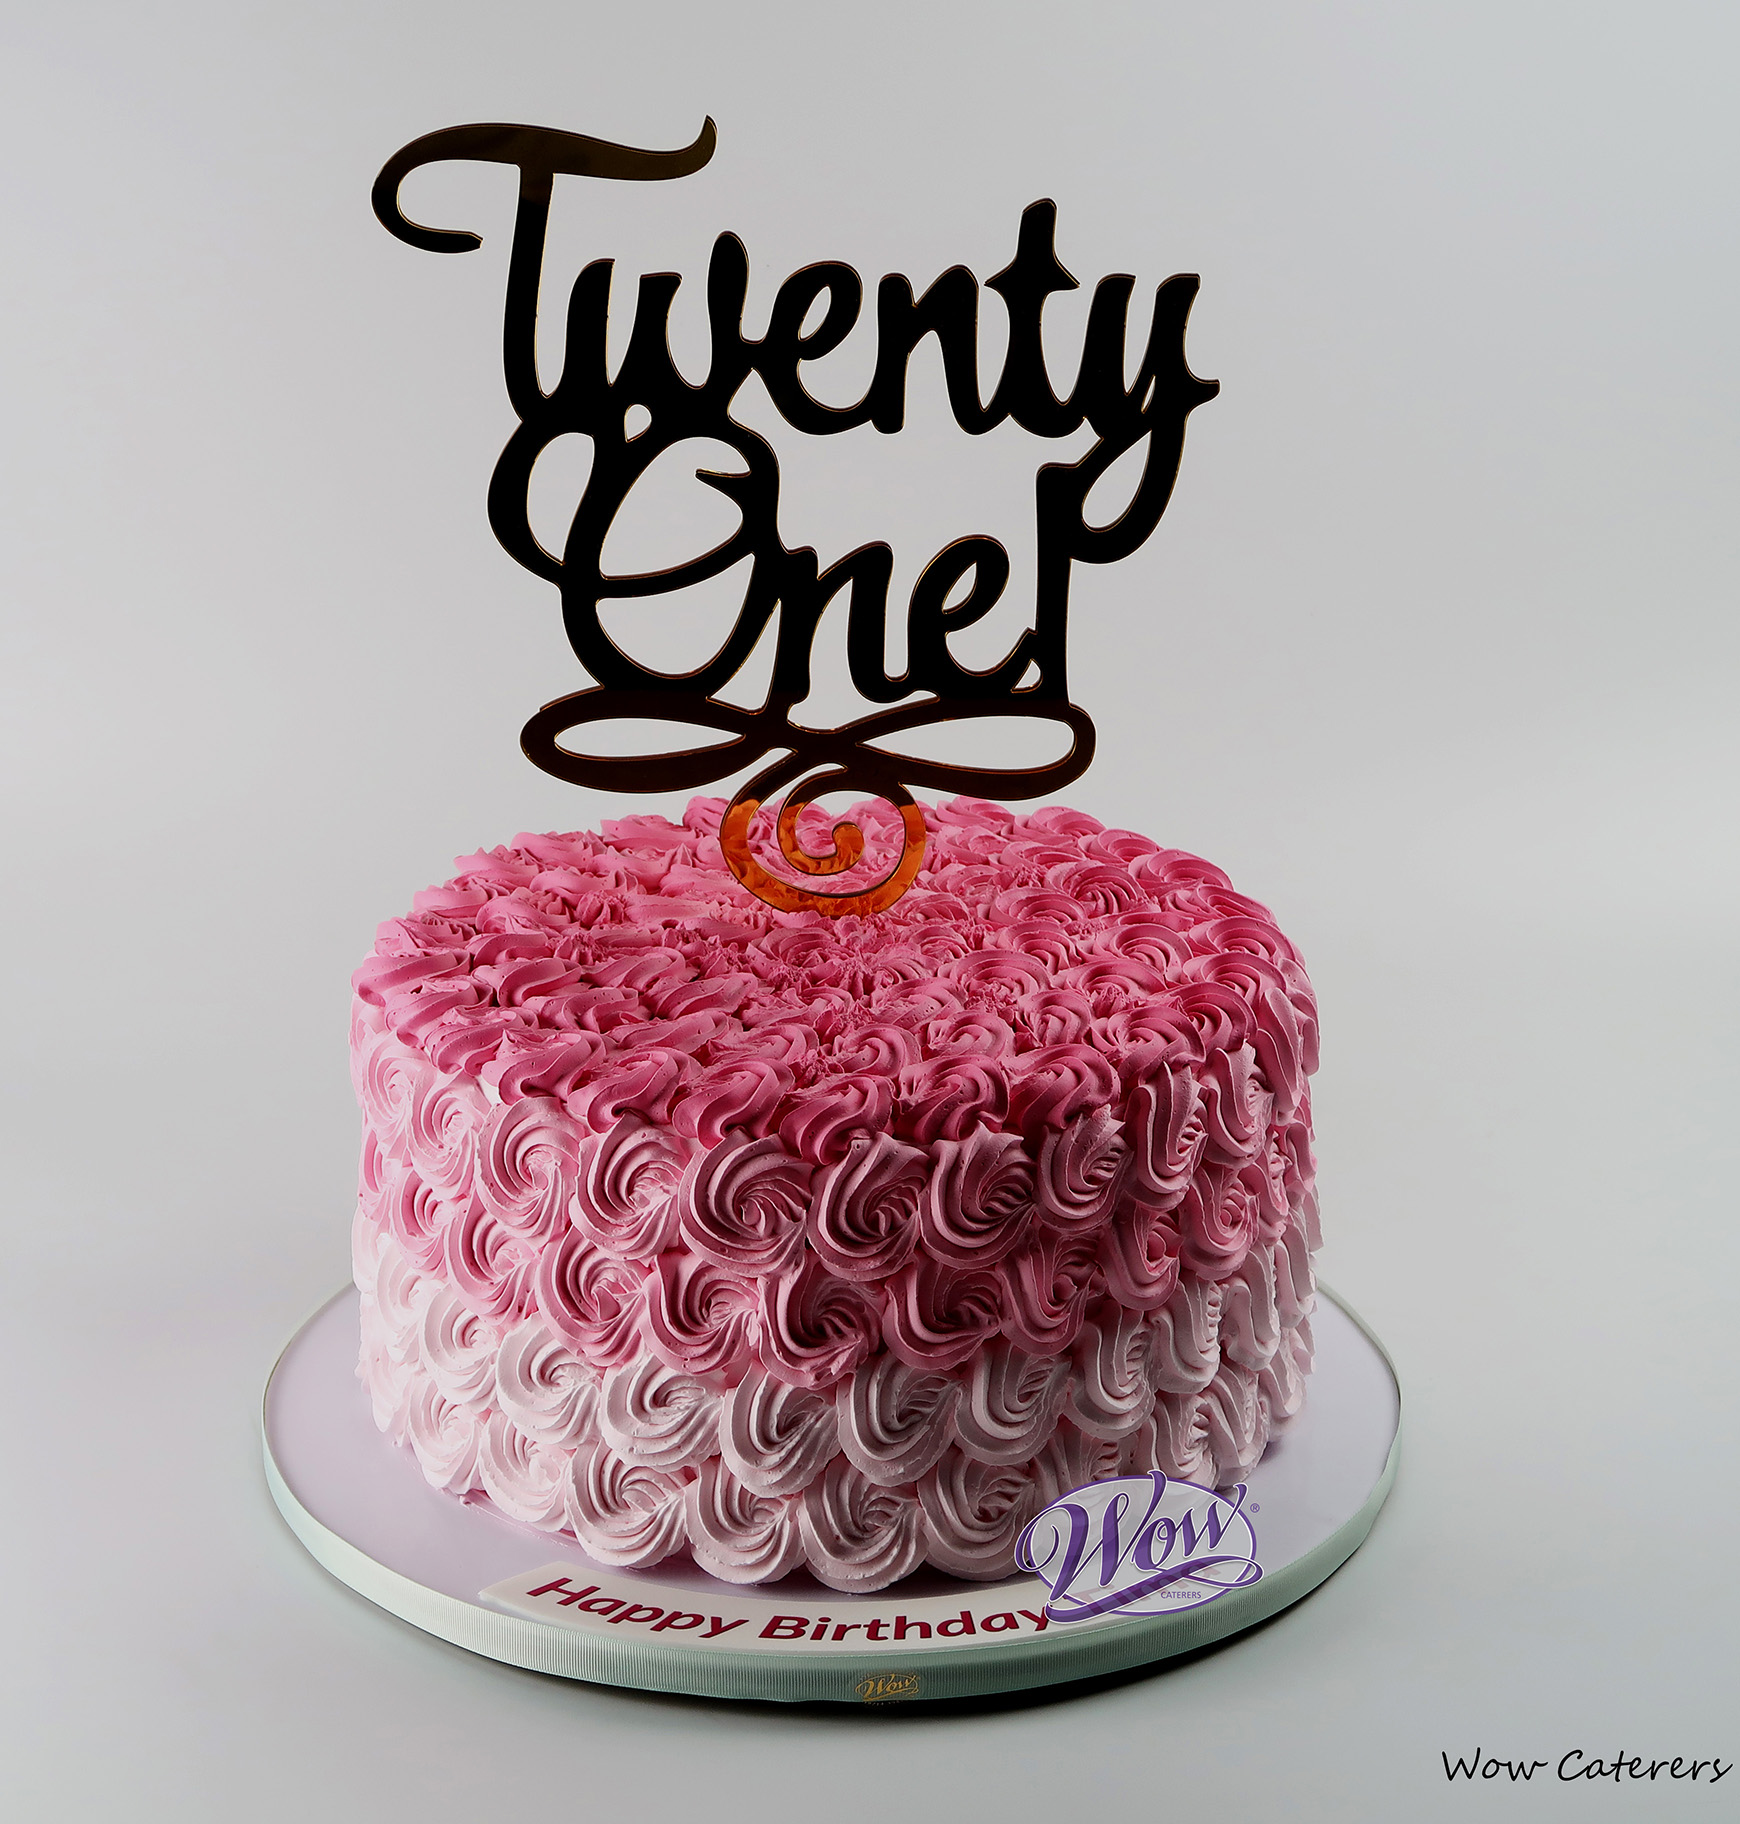 Birthday Cake 32 Wow Caterers